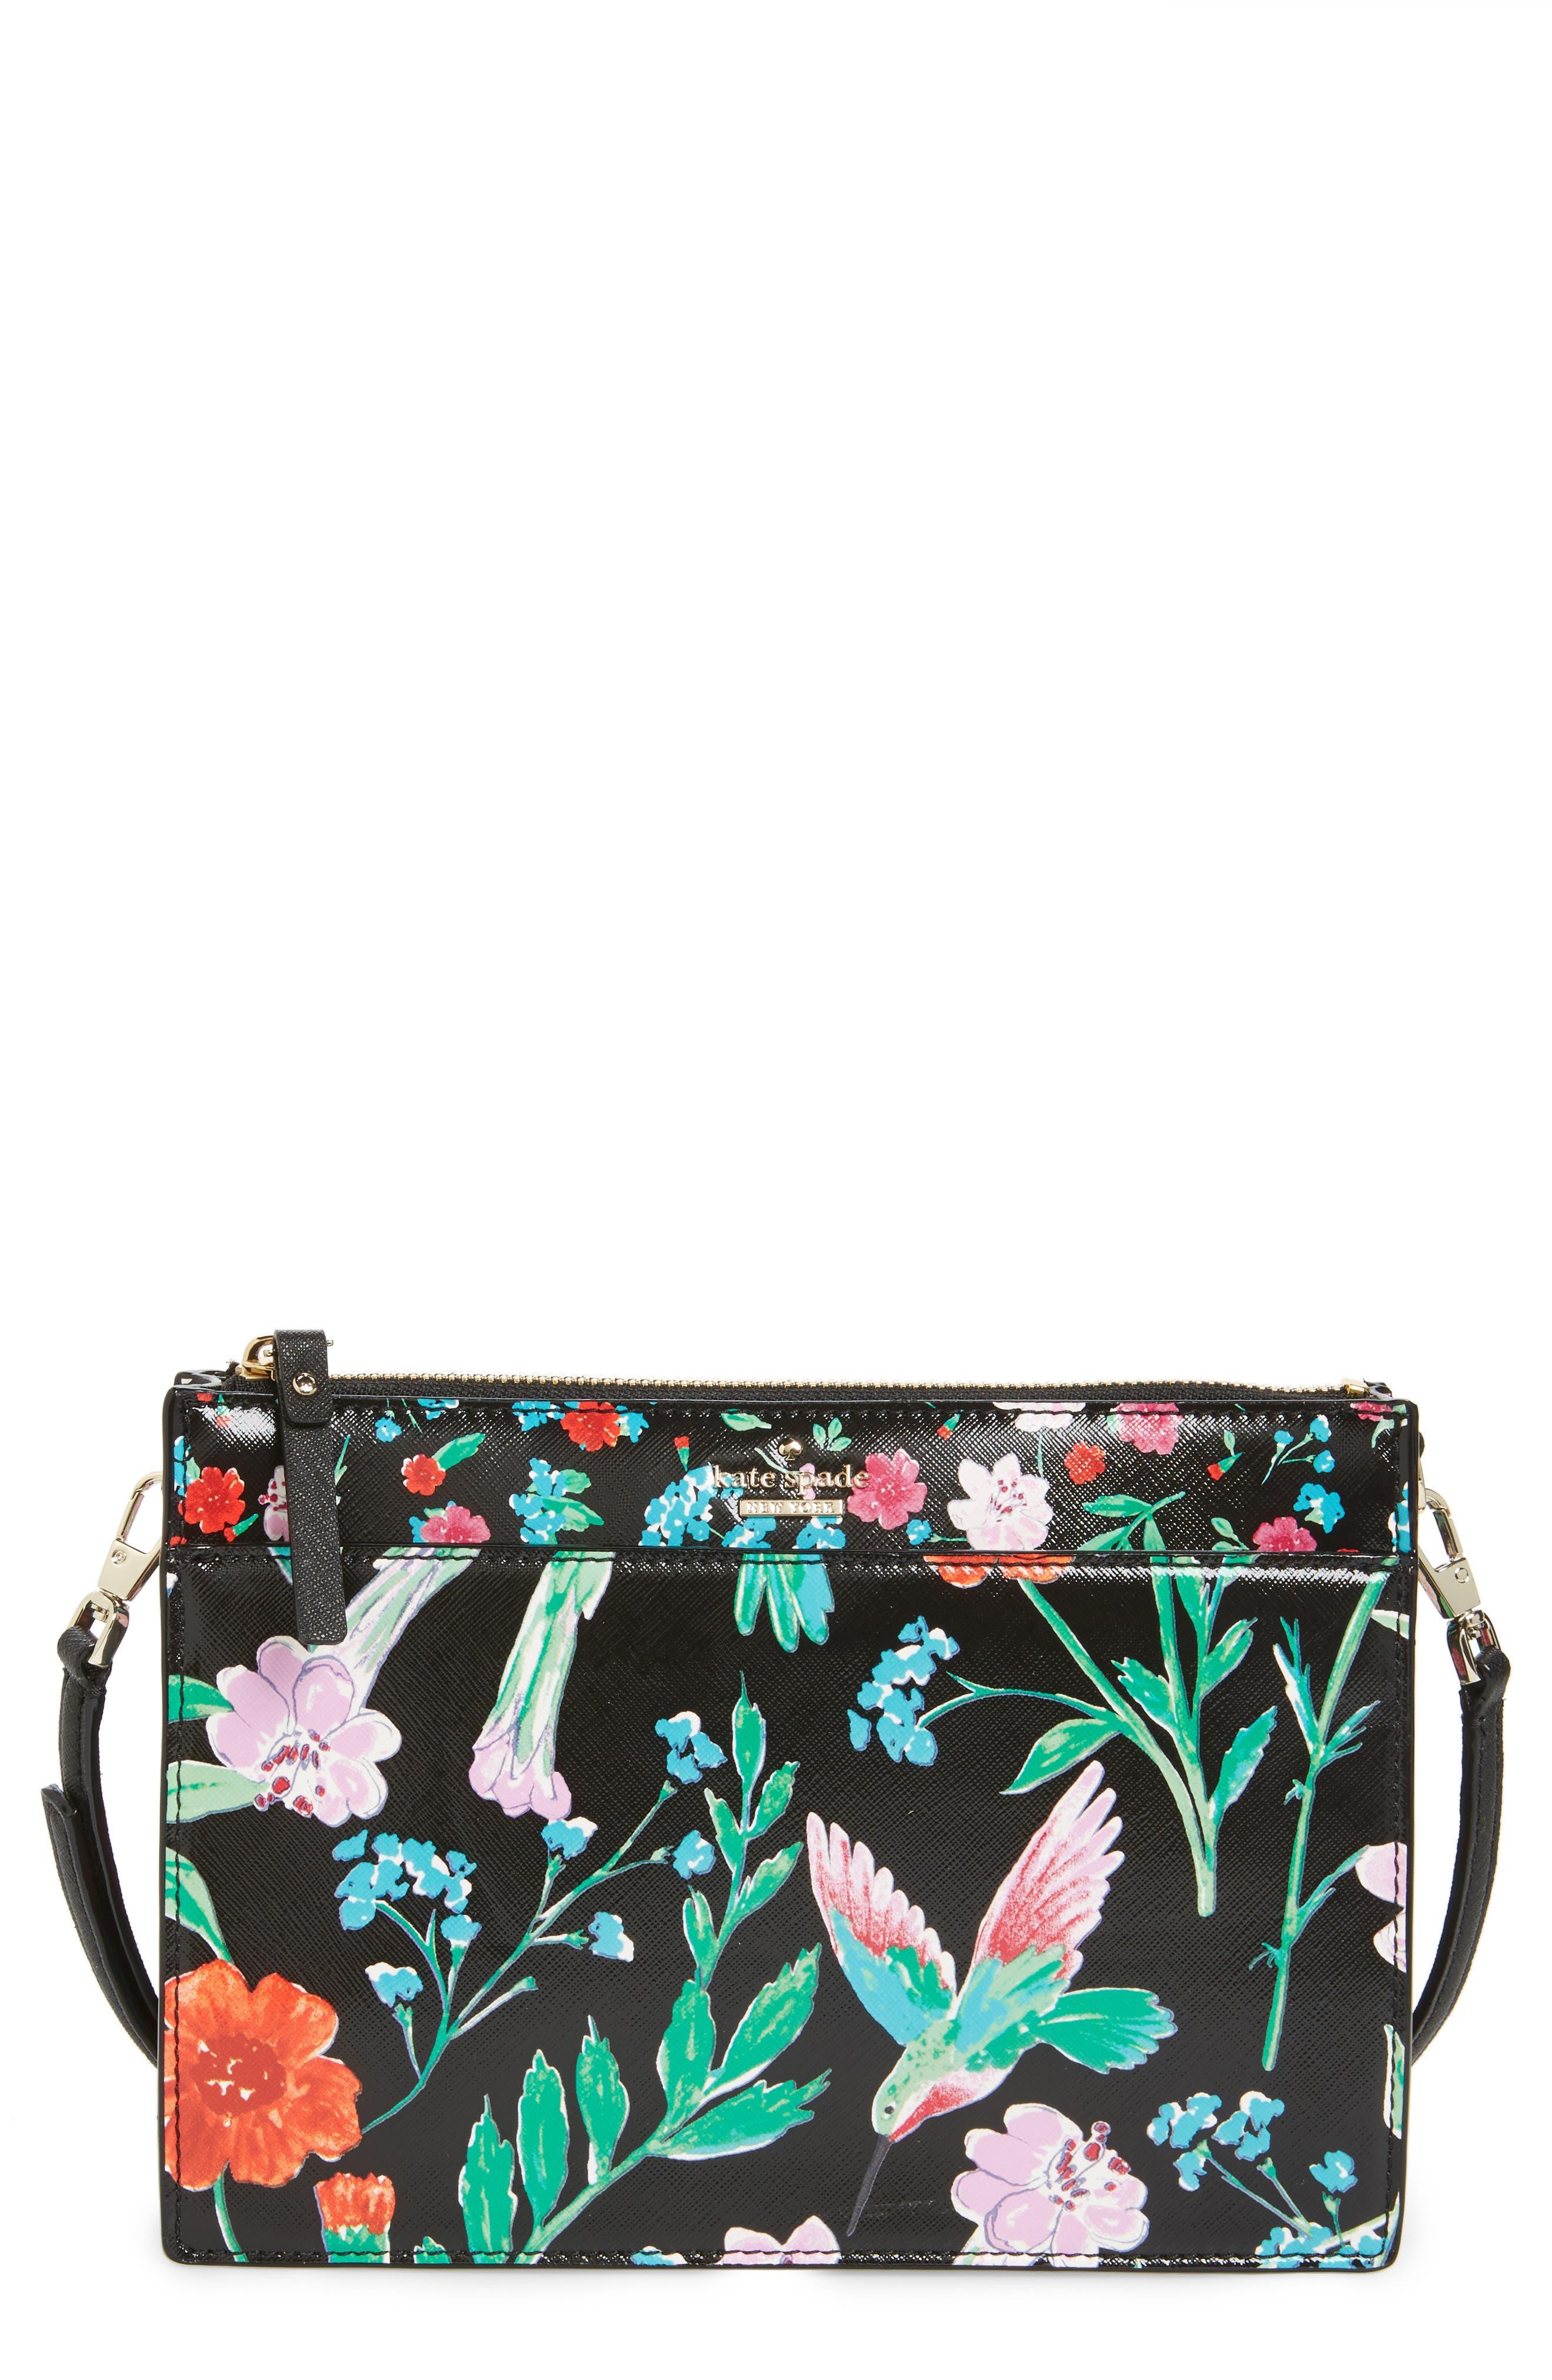 kate spade new york cameron street - jardin clarise faux leather crossbody bag